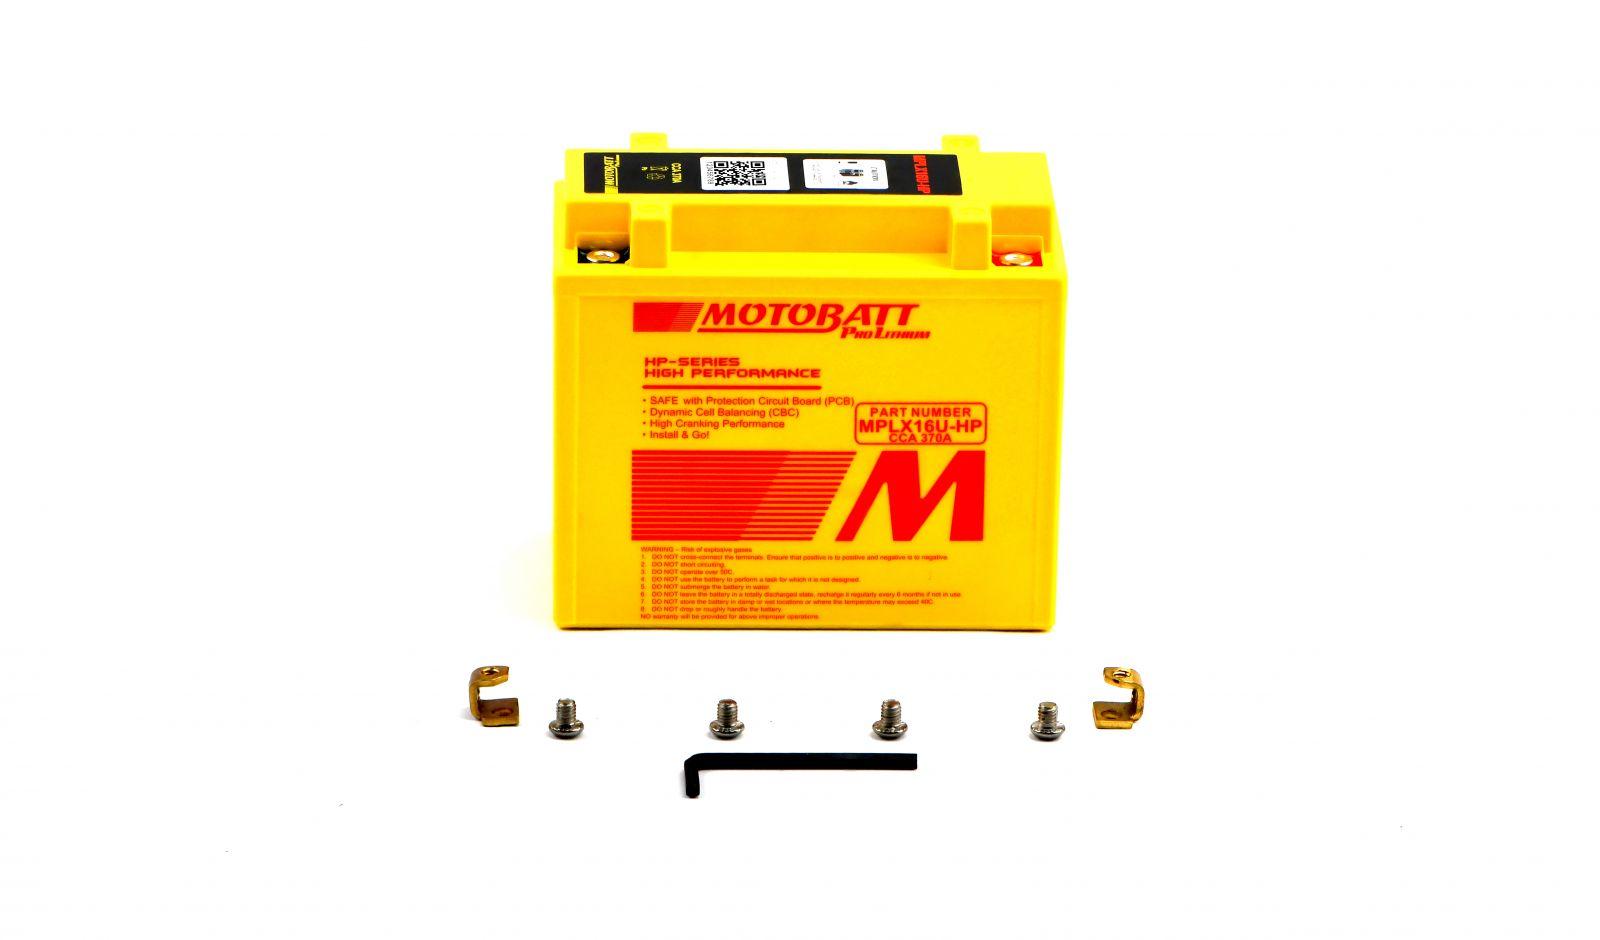 Motobatt Lithium Batteries - 501165MR image